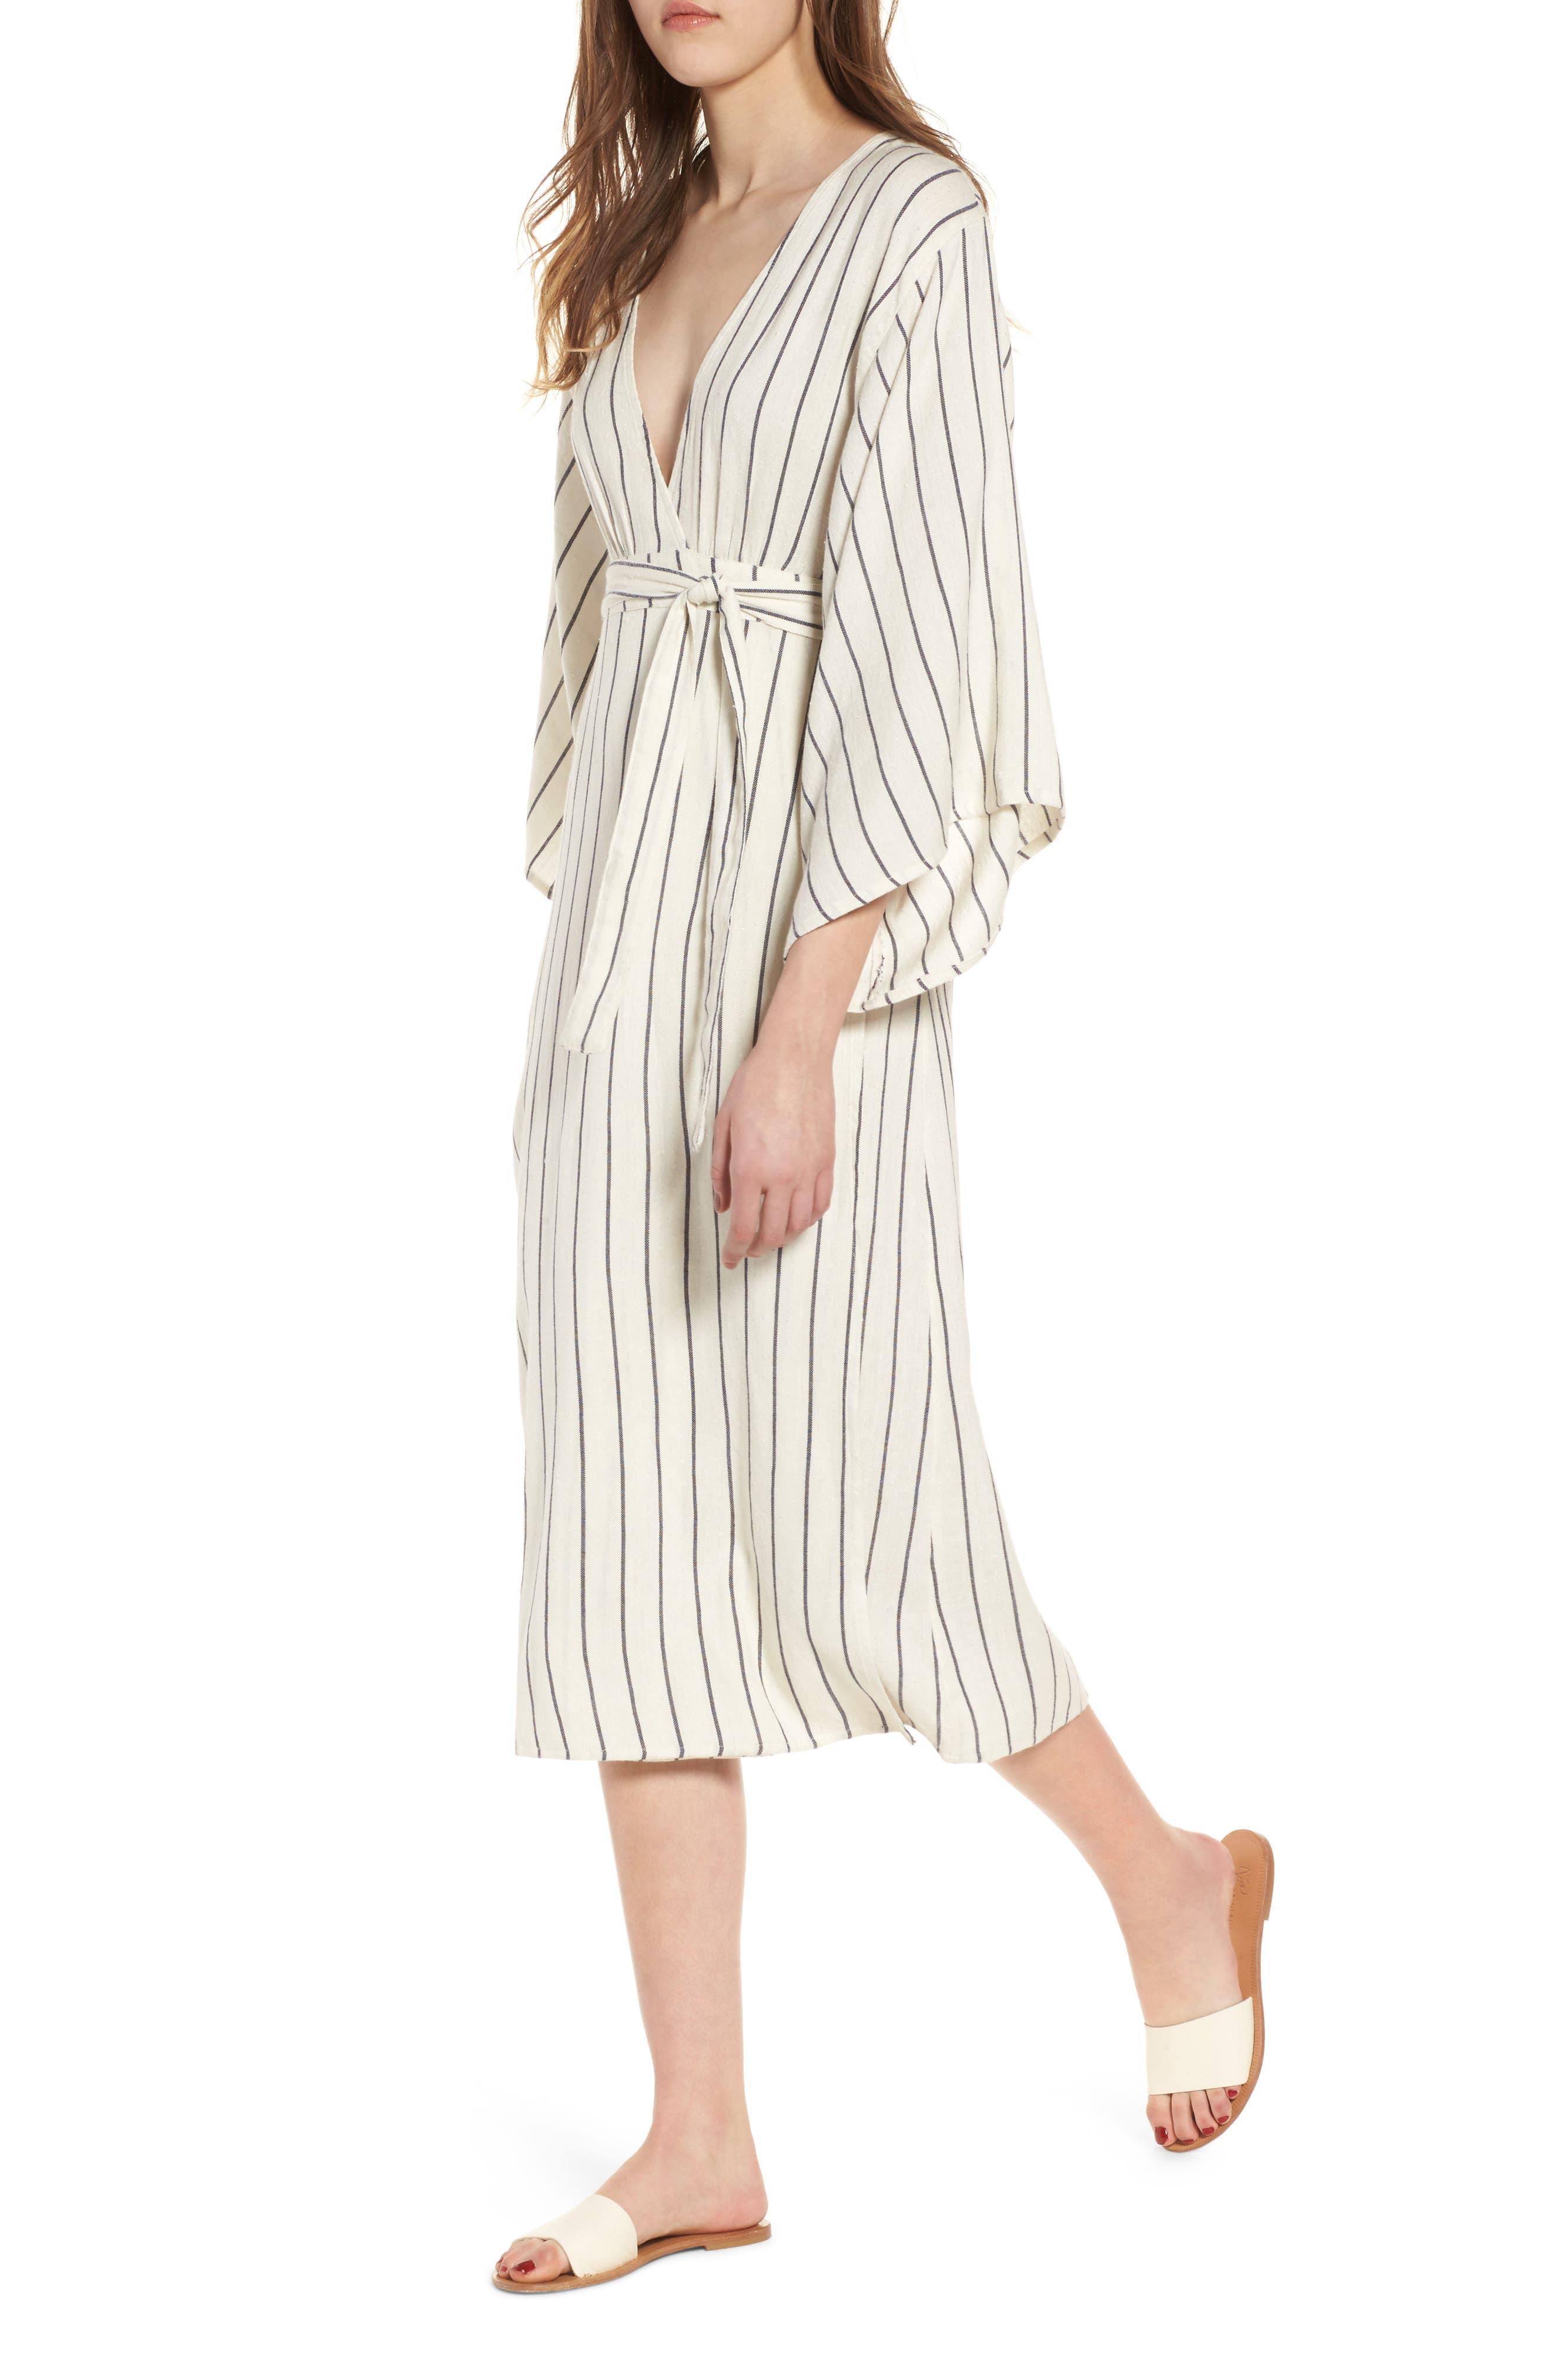 Robe Life Striped Midi Dress,                             Main thumbnail 1, color,                             Cool Wip